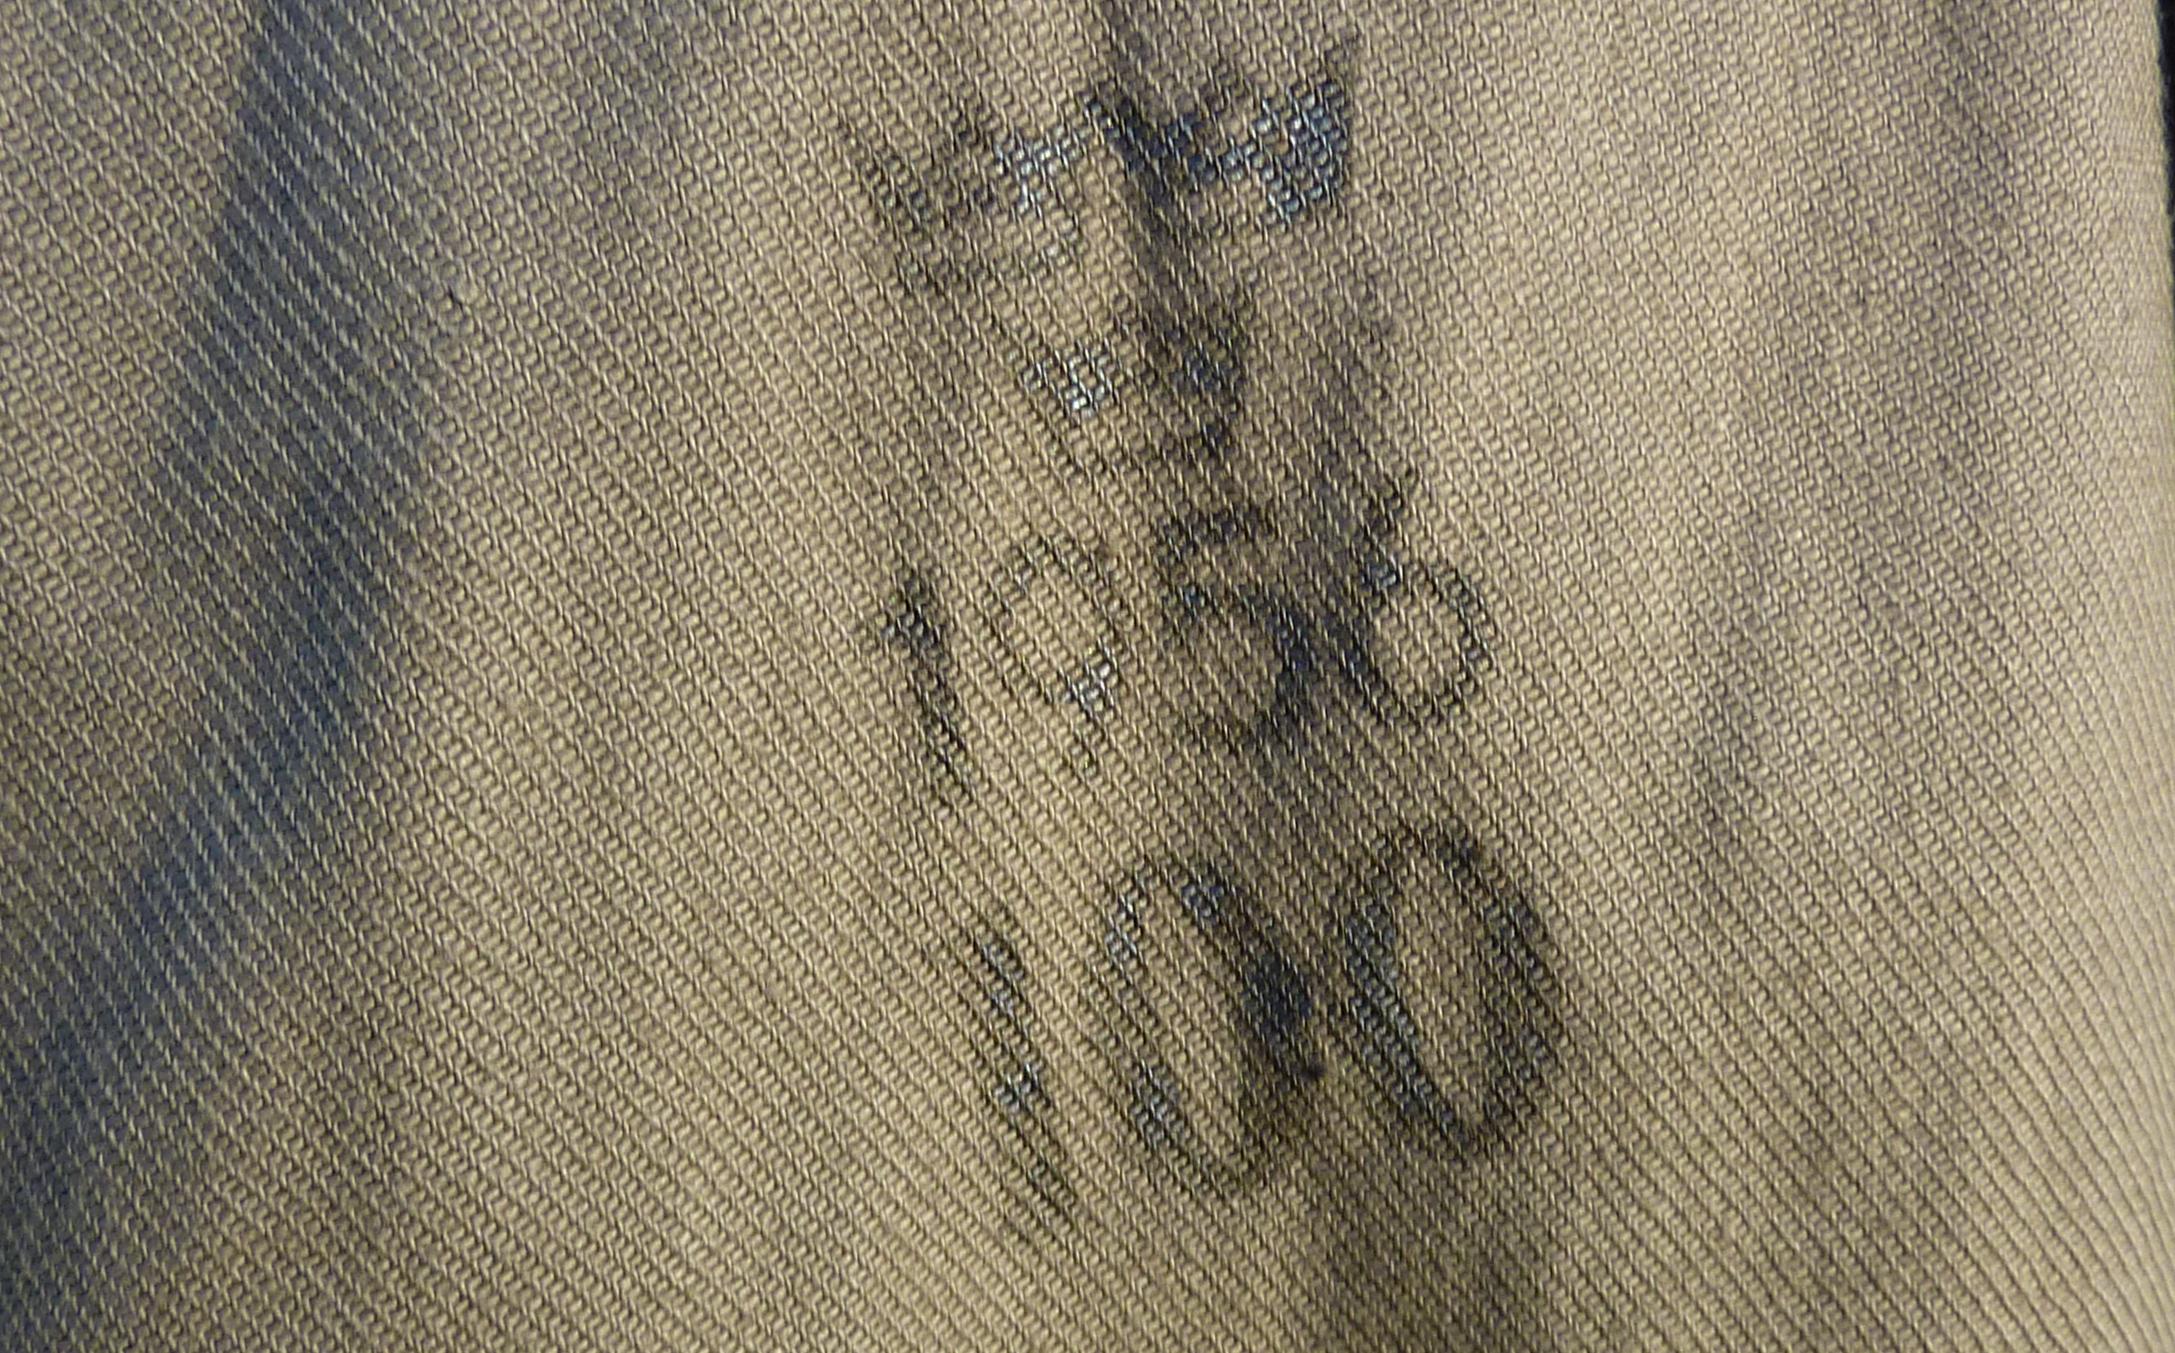 P1070091